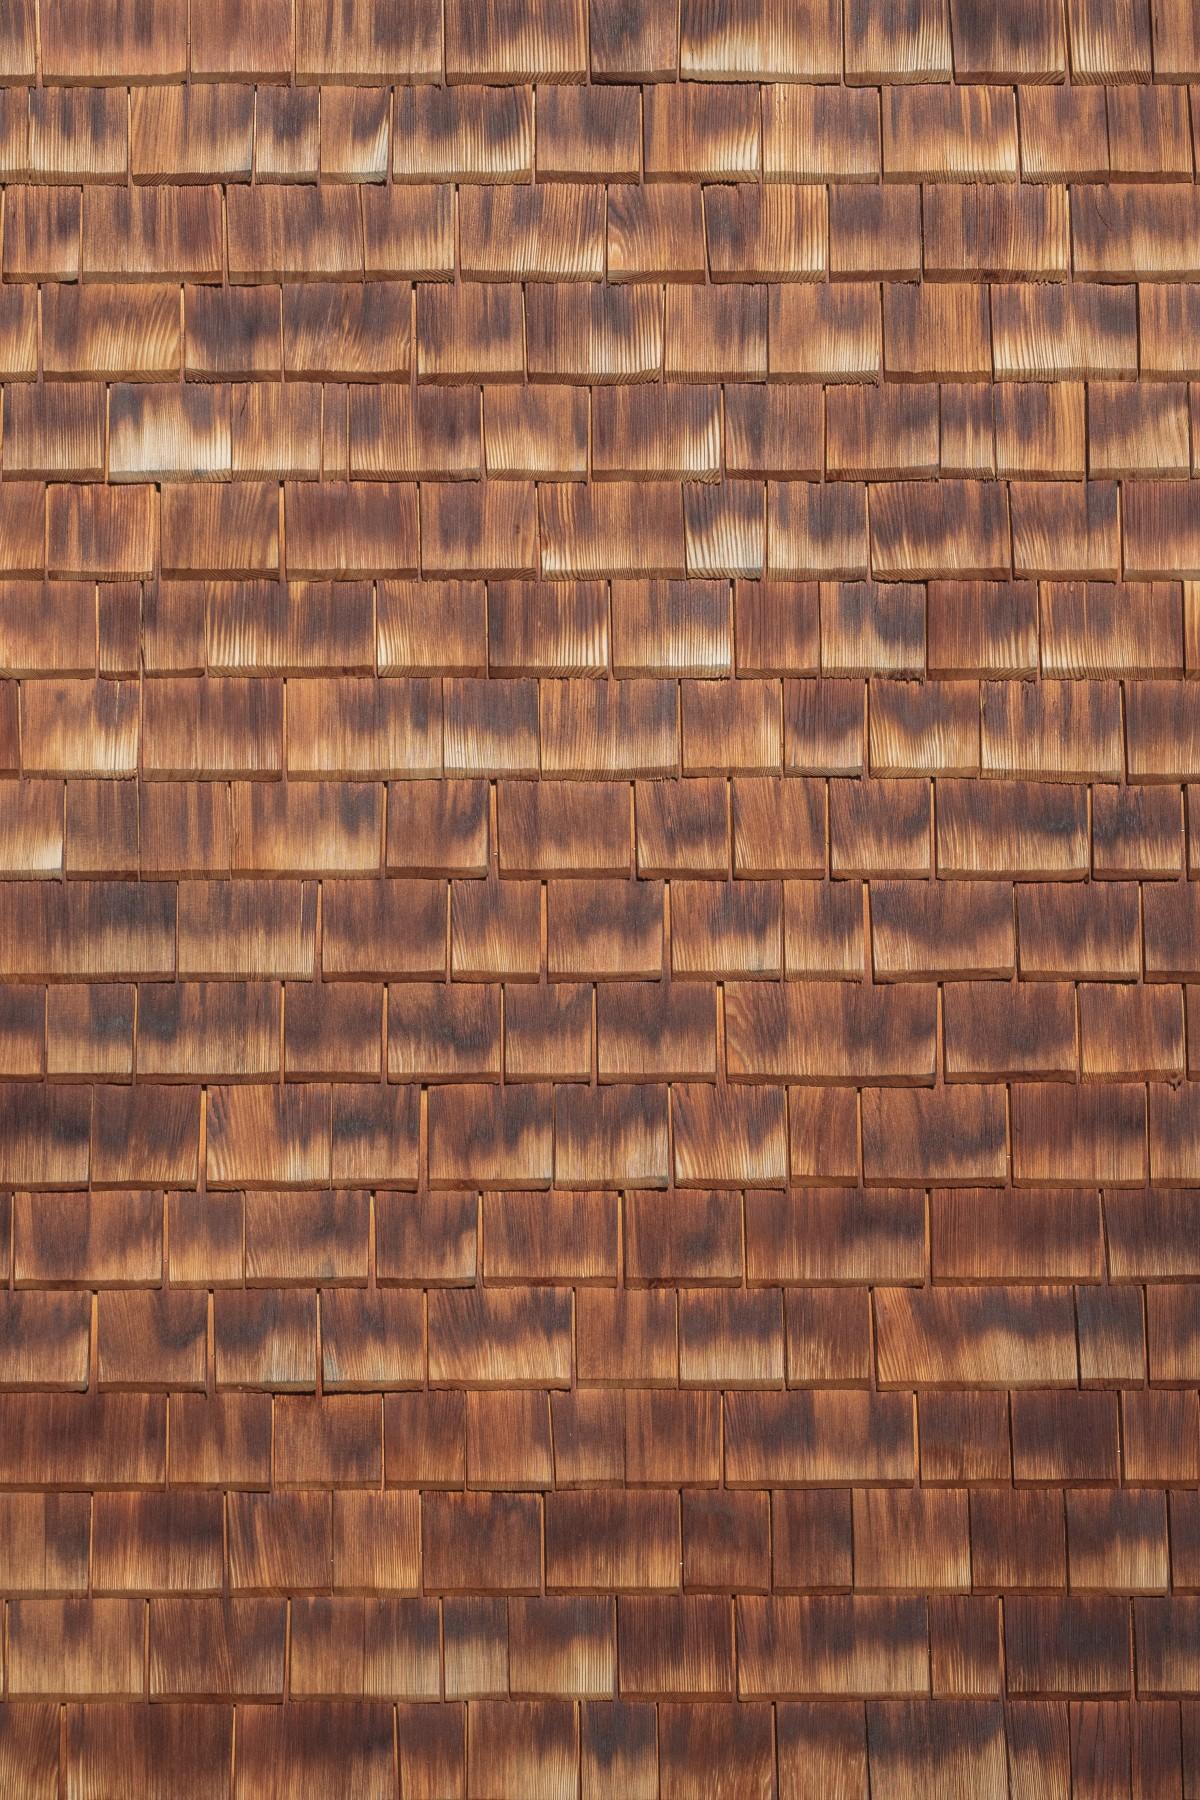 Fotos gratis  textura piso pared azulejo ladrillo